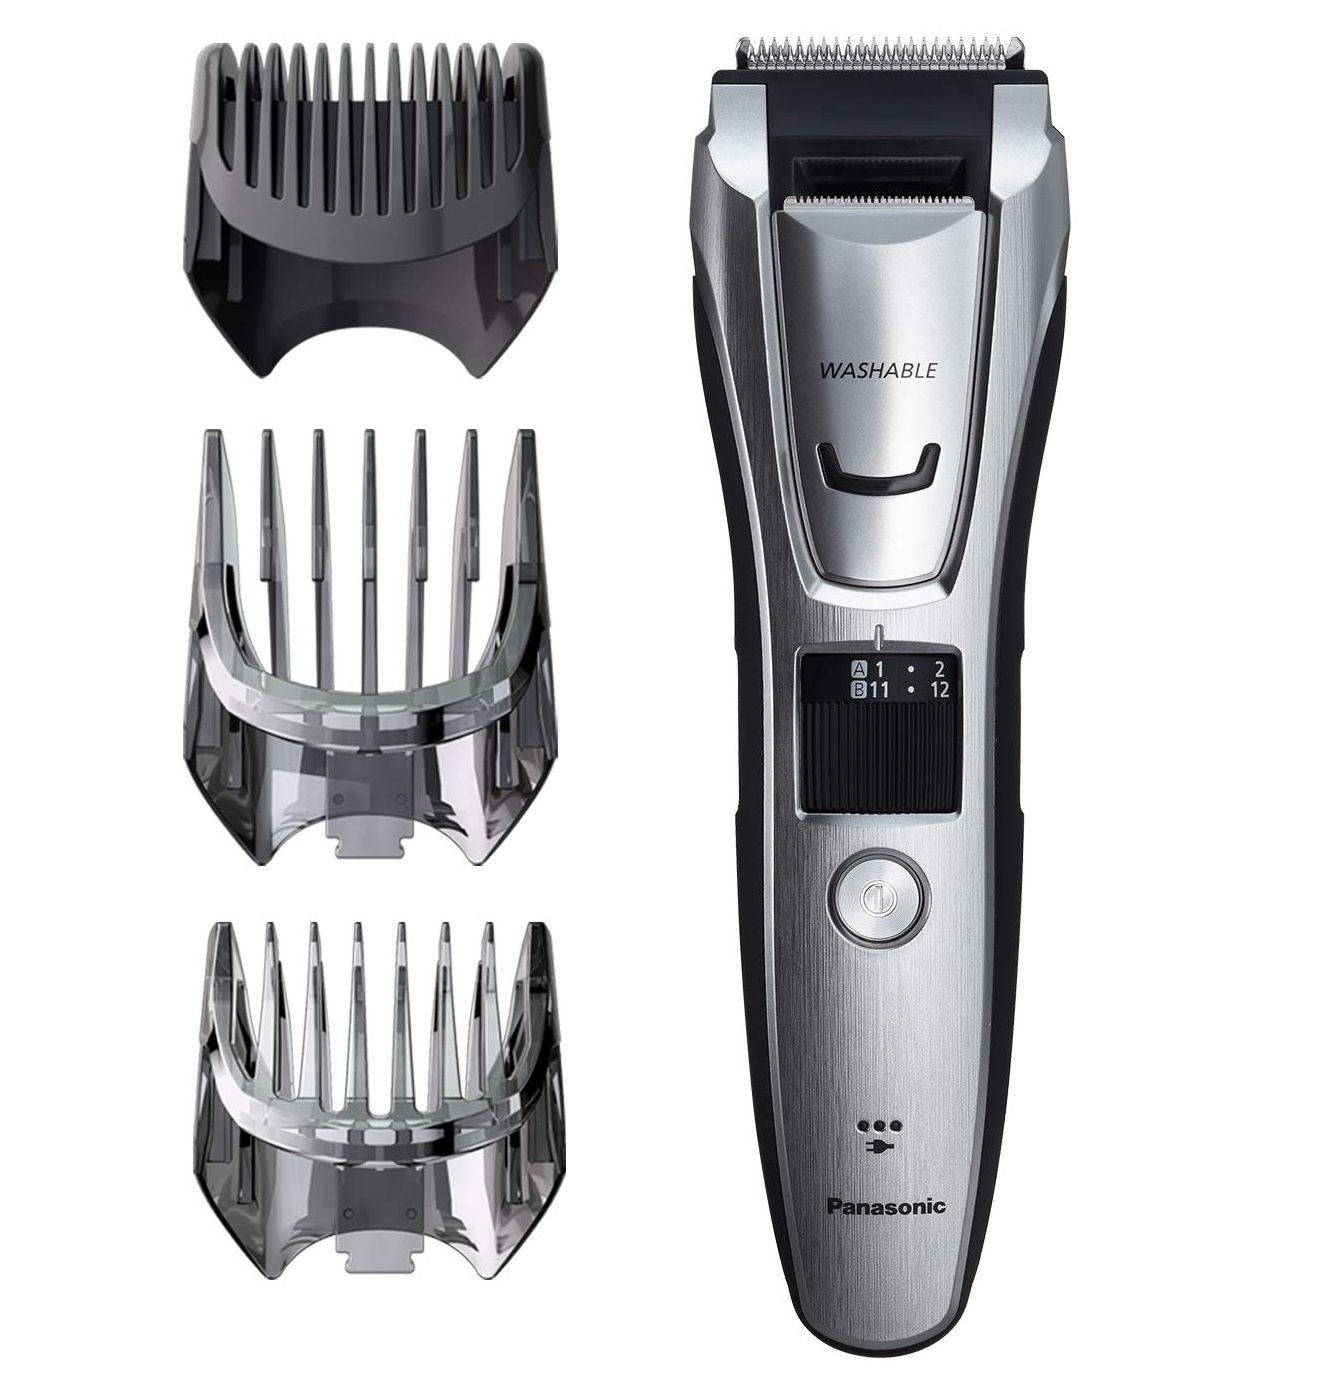 Panasonic Multigroom Beard Trimmer